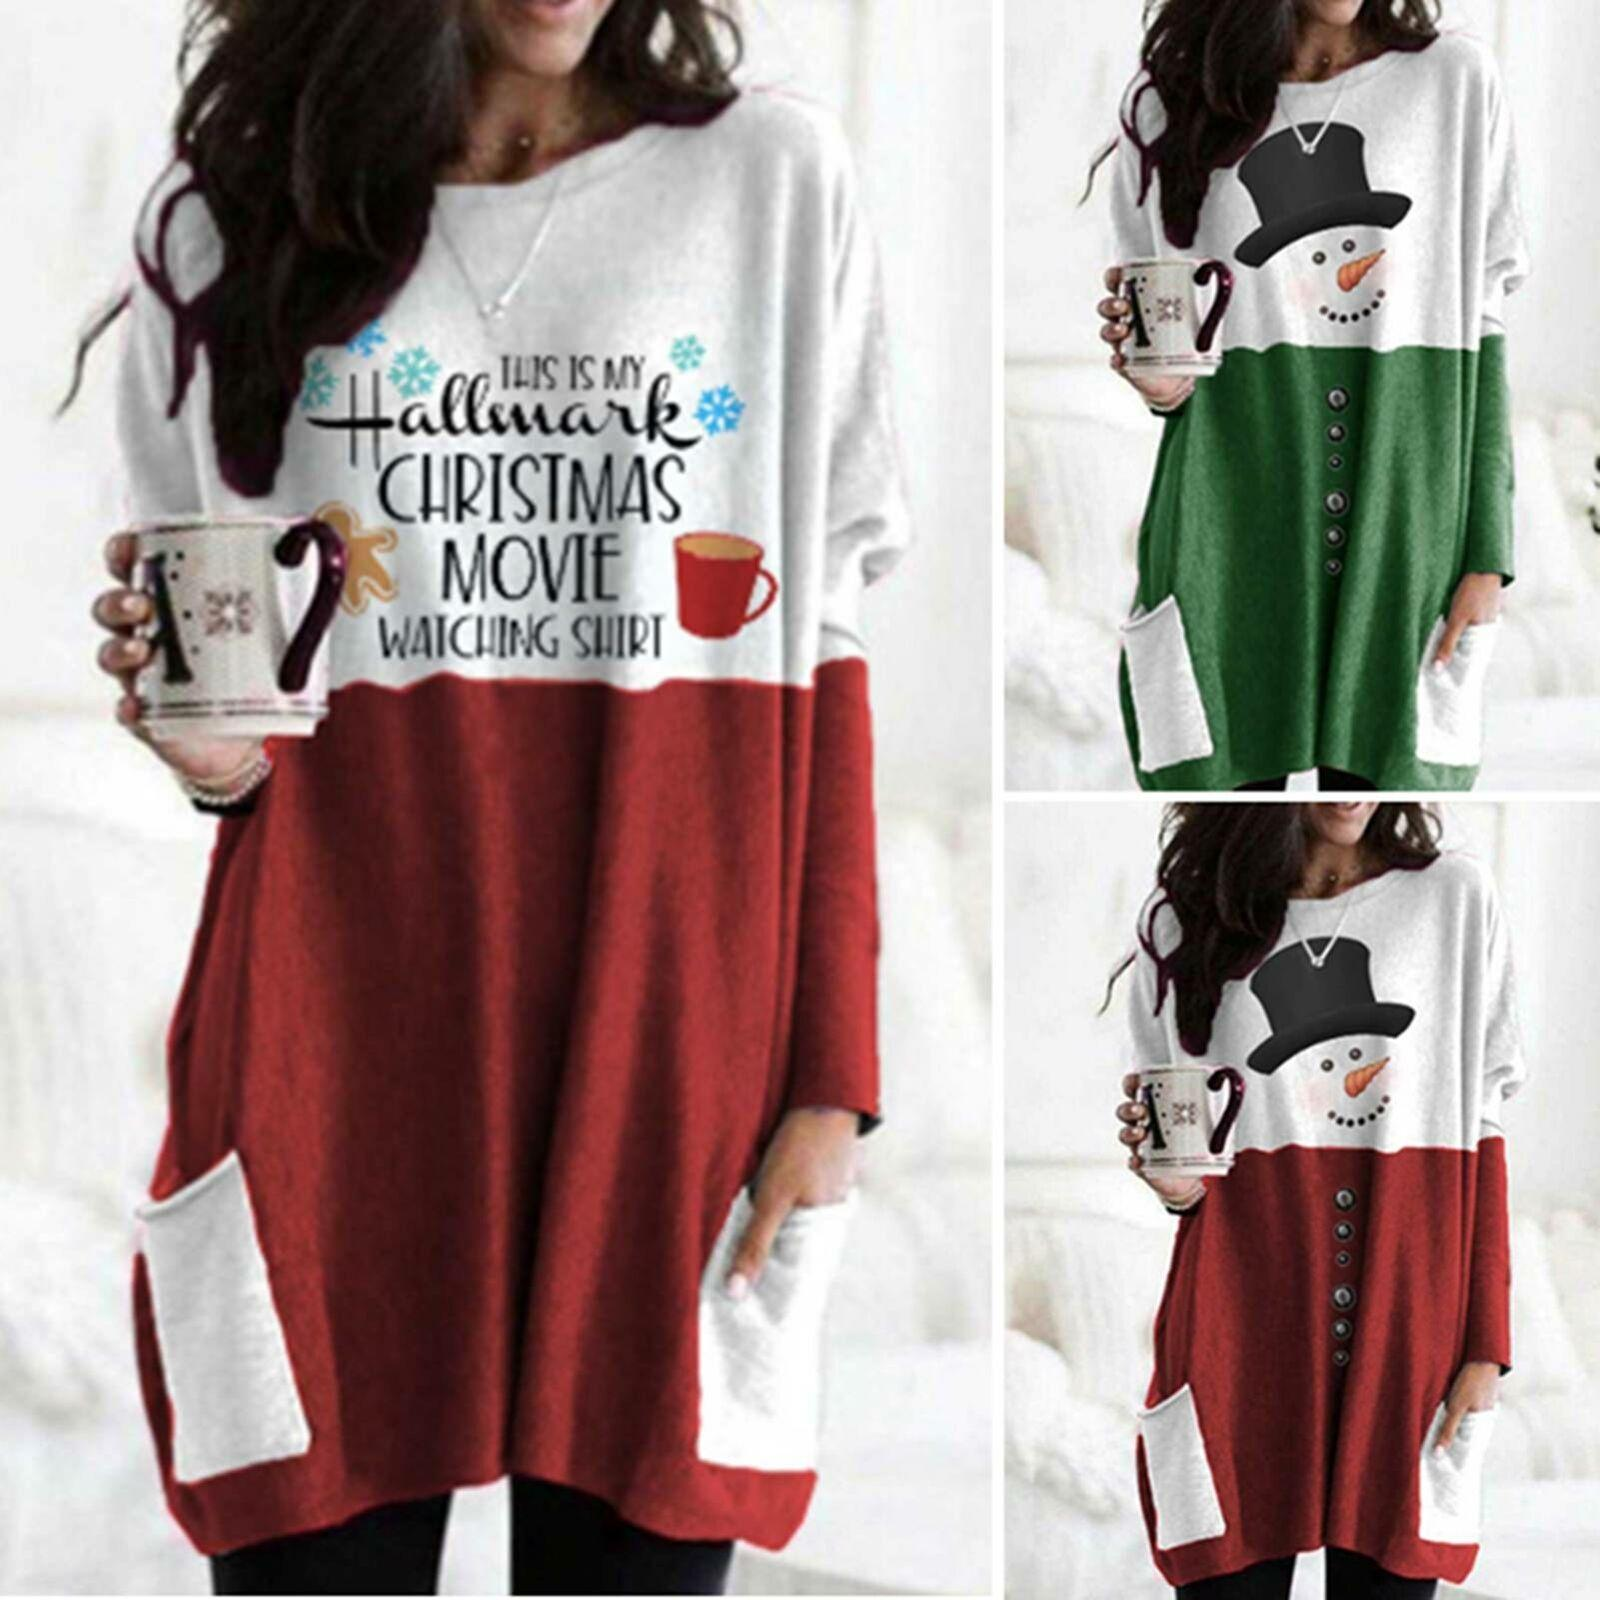 4Colour S-5XL 여성 의류 유행 크리스마스 디지털 인쇄 긴 여성 T 셔츠 새로운 여성의상의 티셔츠 T 셔츠 26581595719830